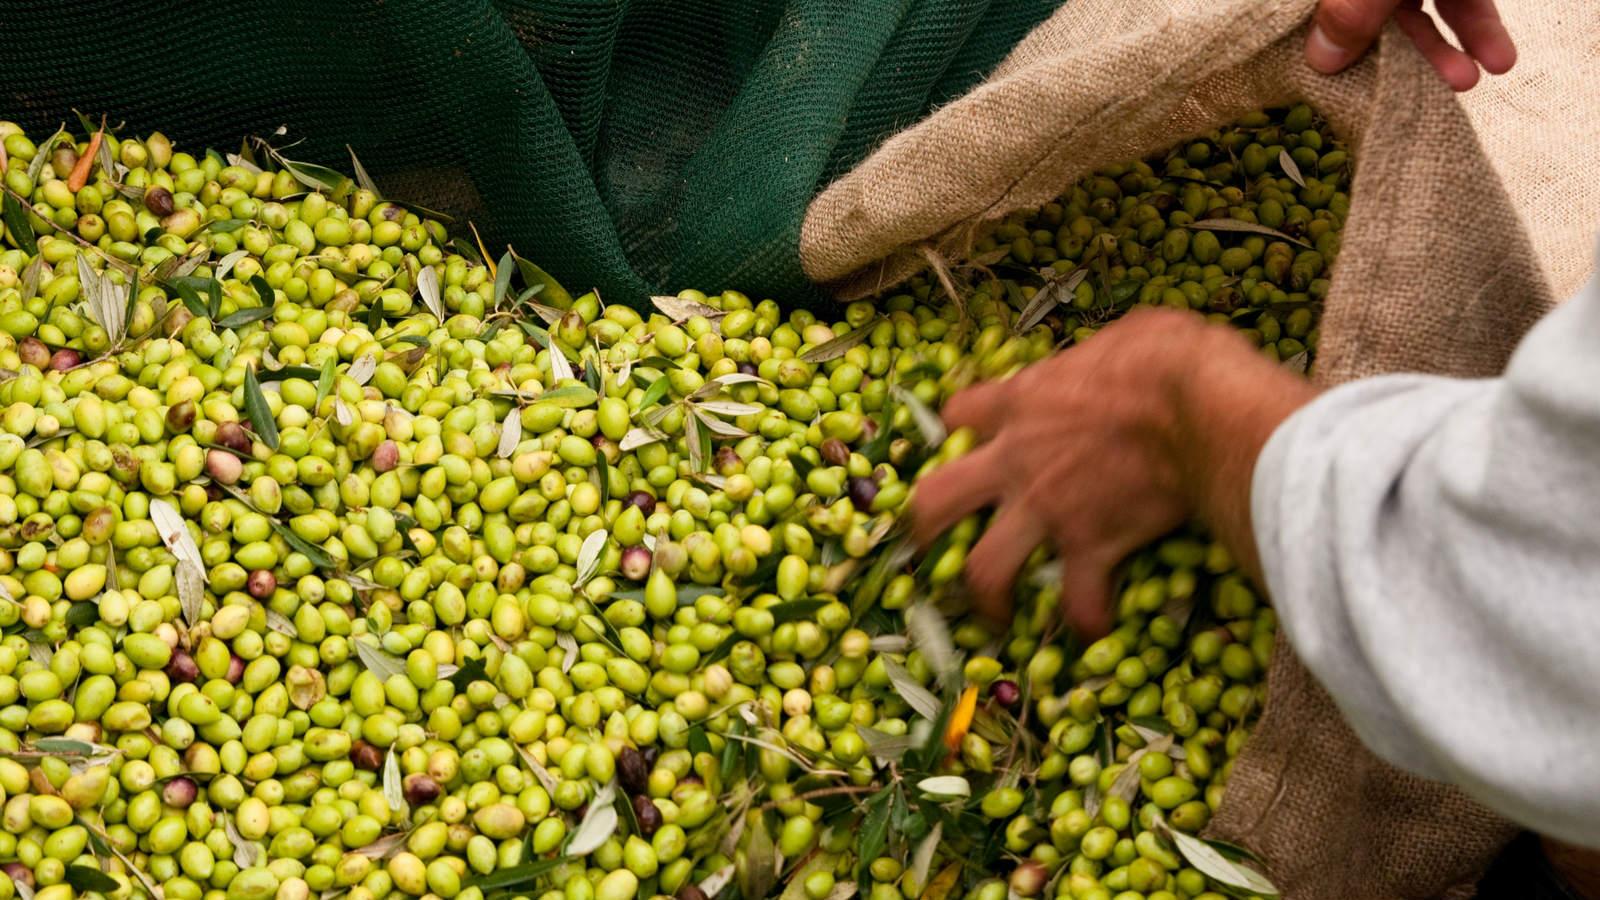 The-Irida-Resort-Suites-Messinian-Authenticity-Program-Olive-Harvesting